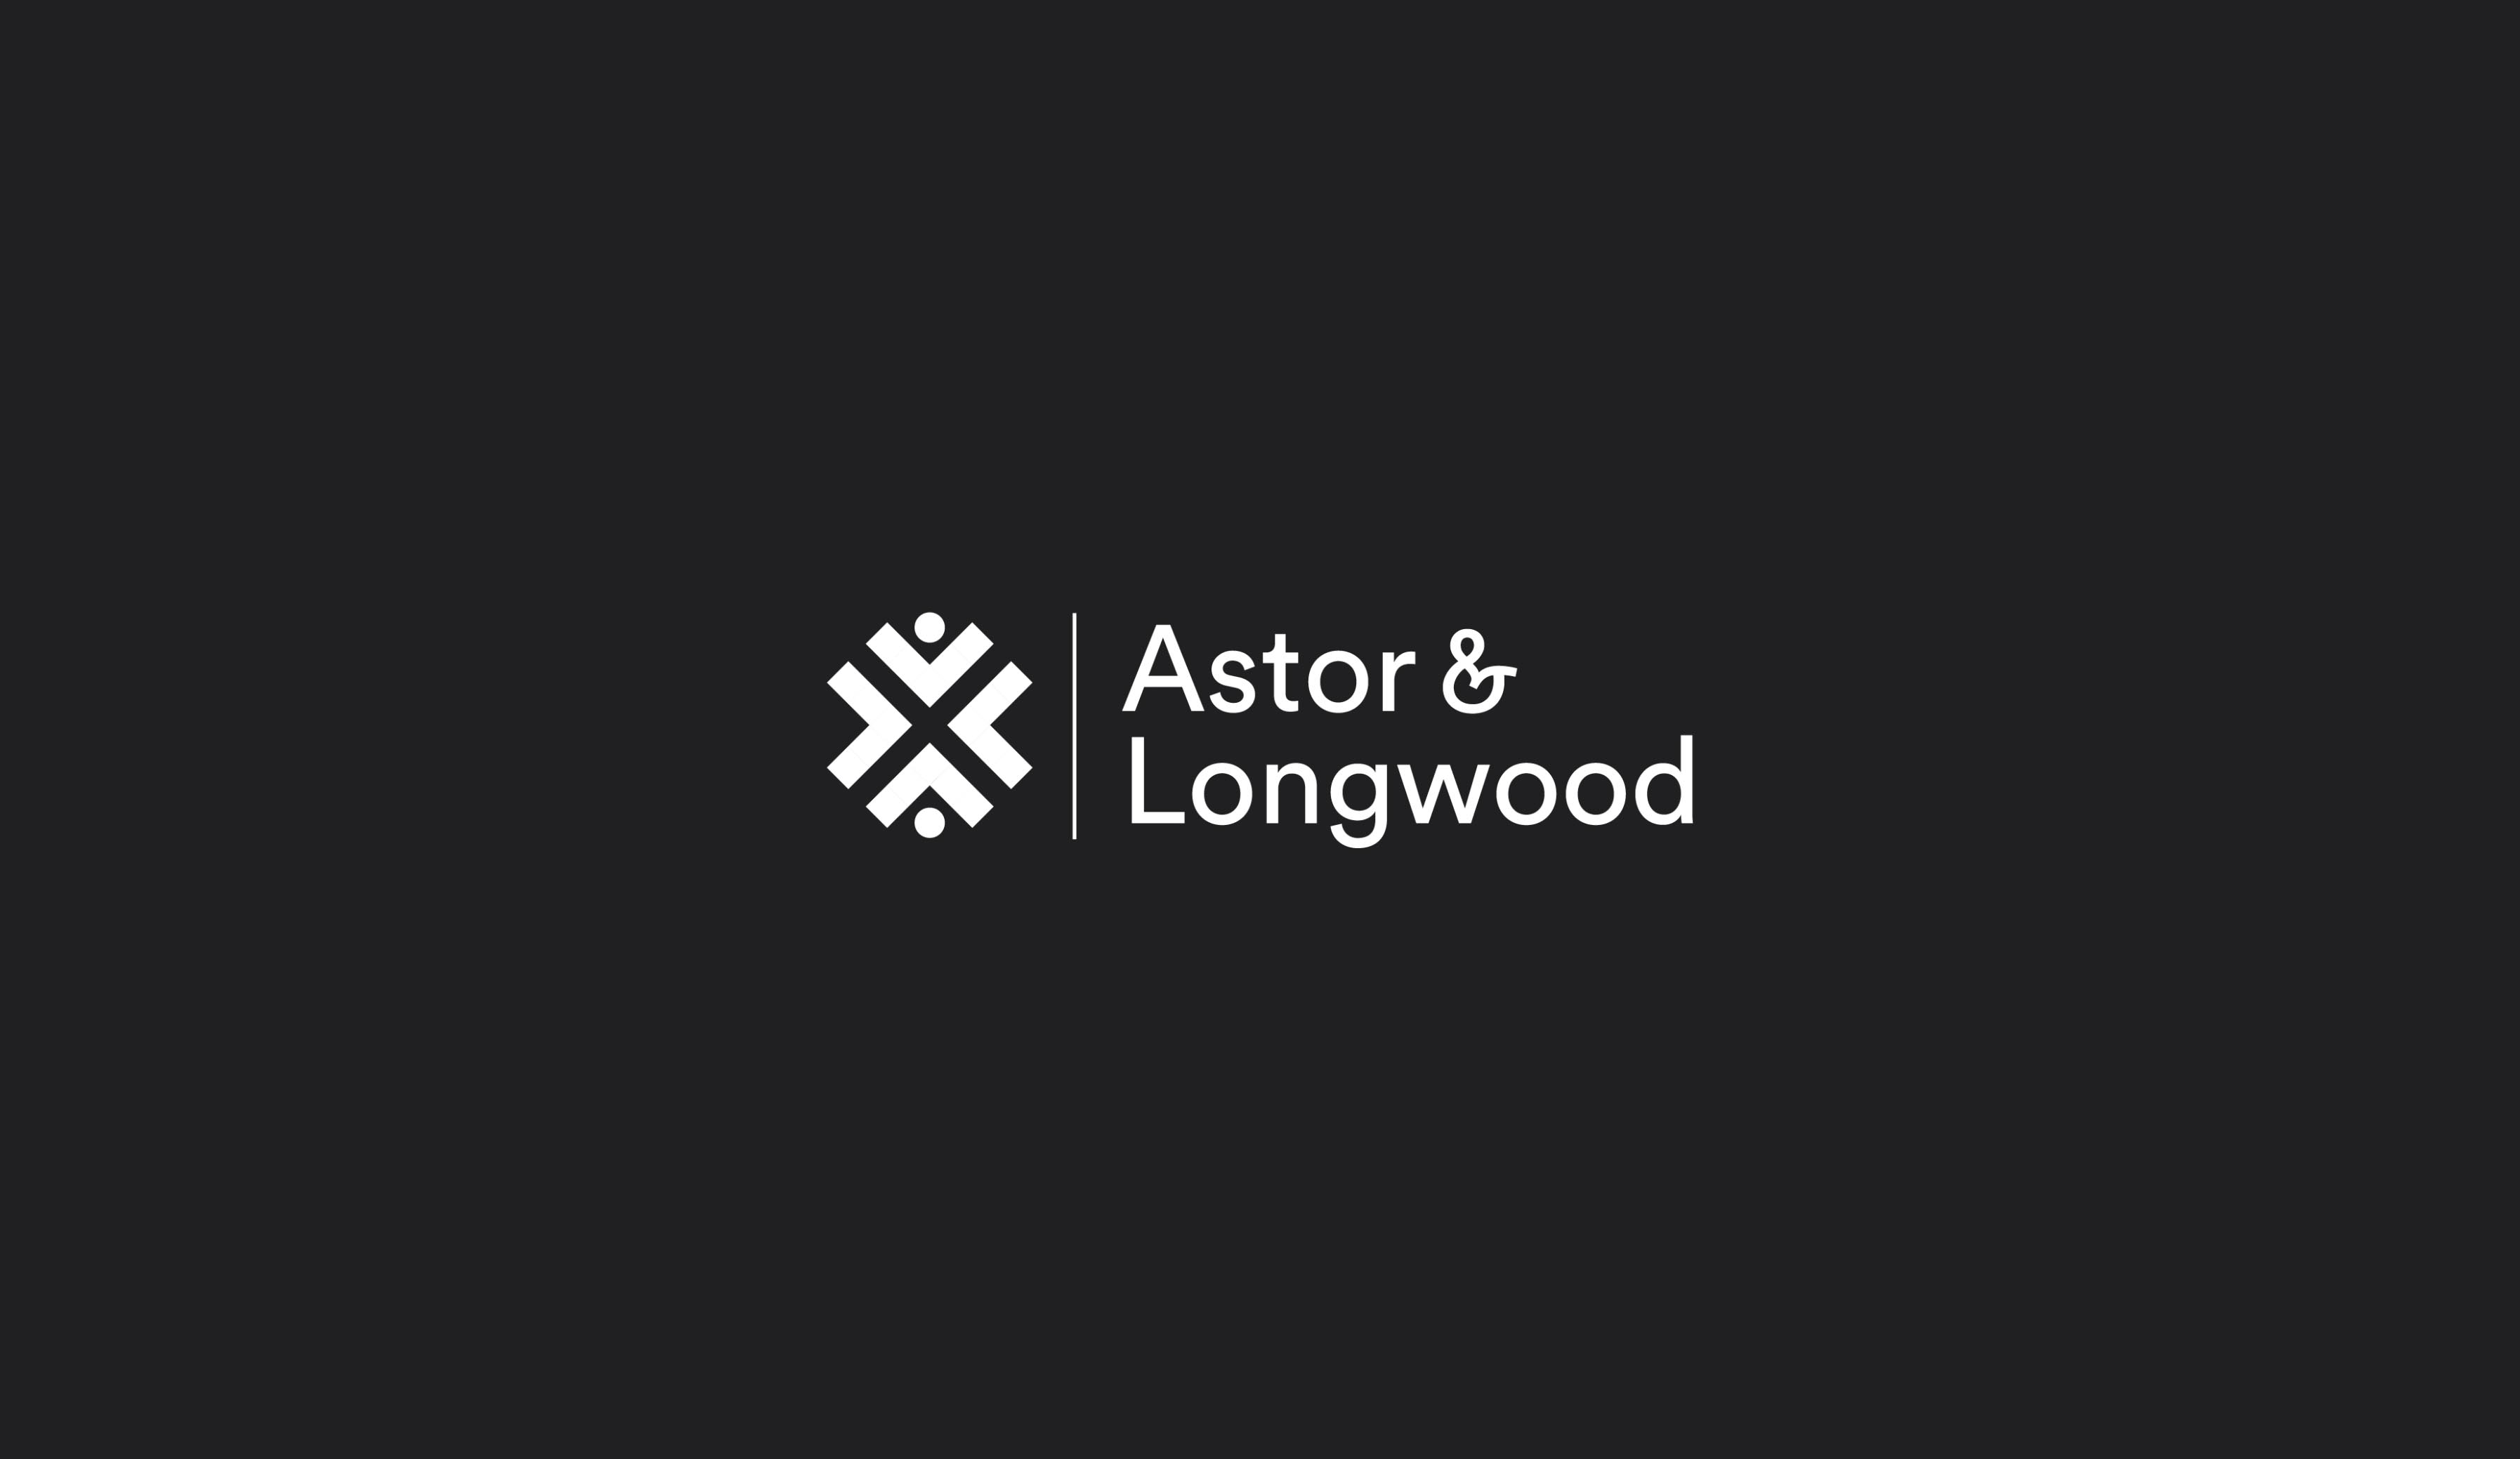 Astor and Longwood logo design